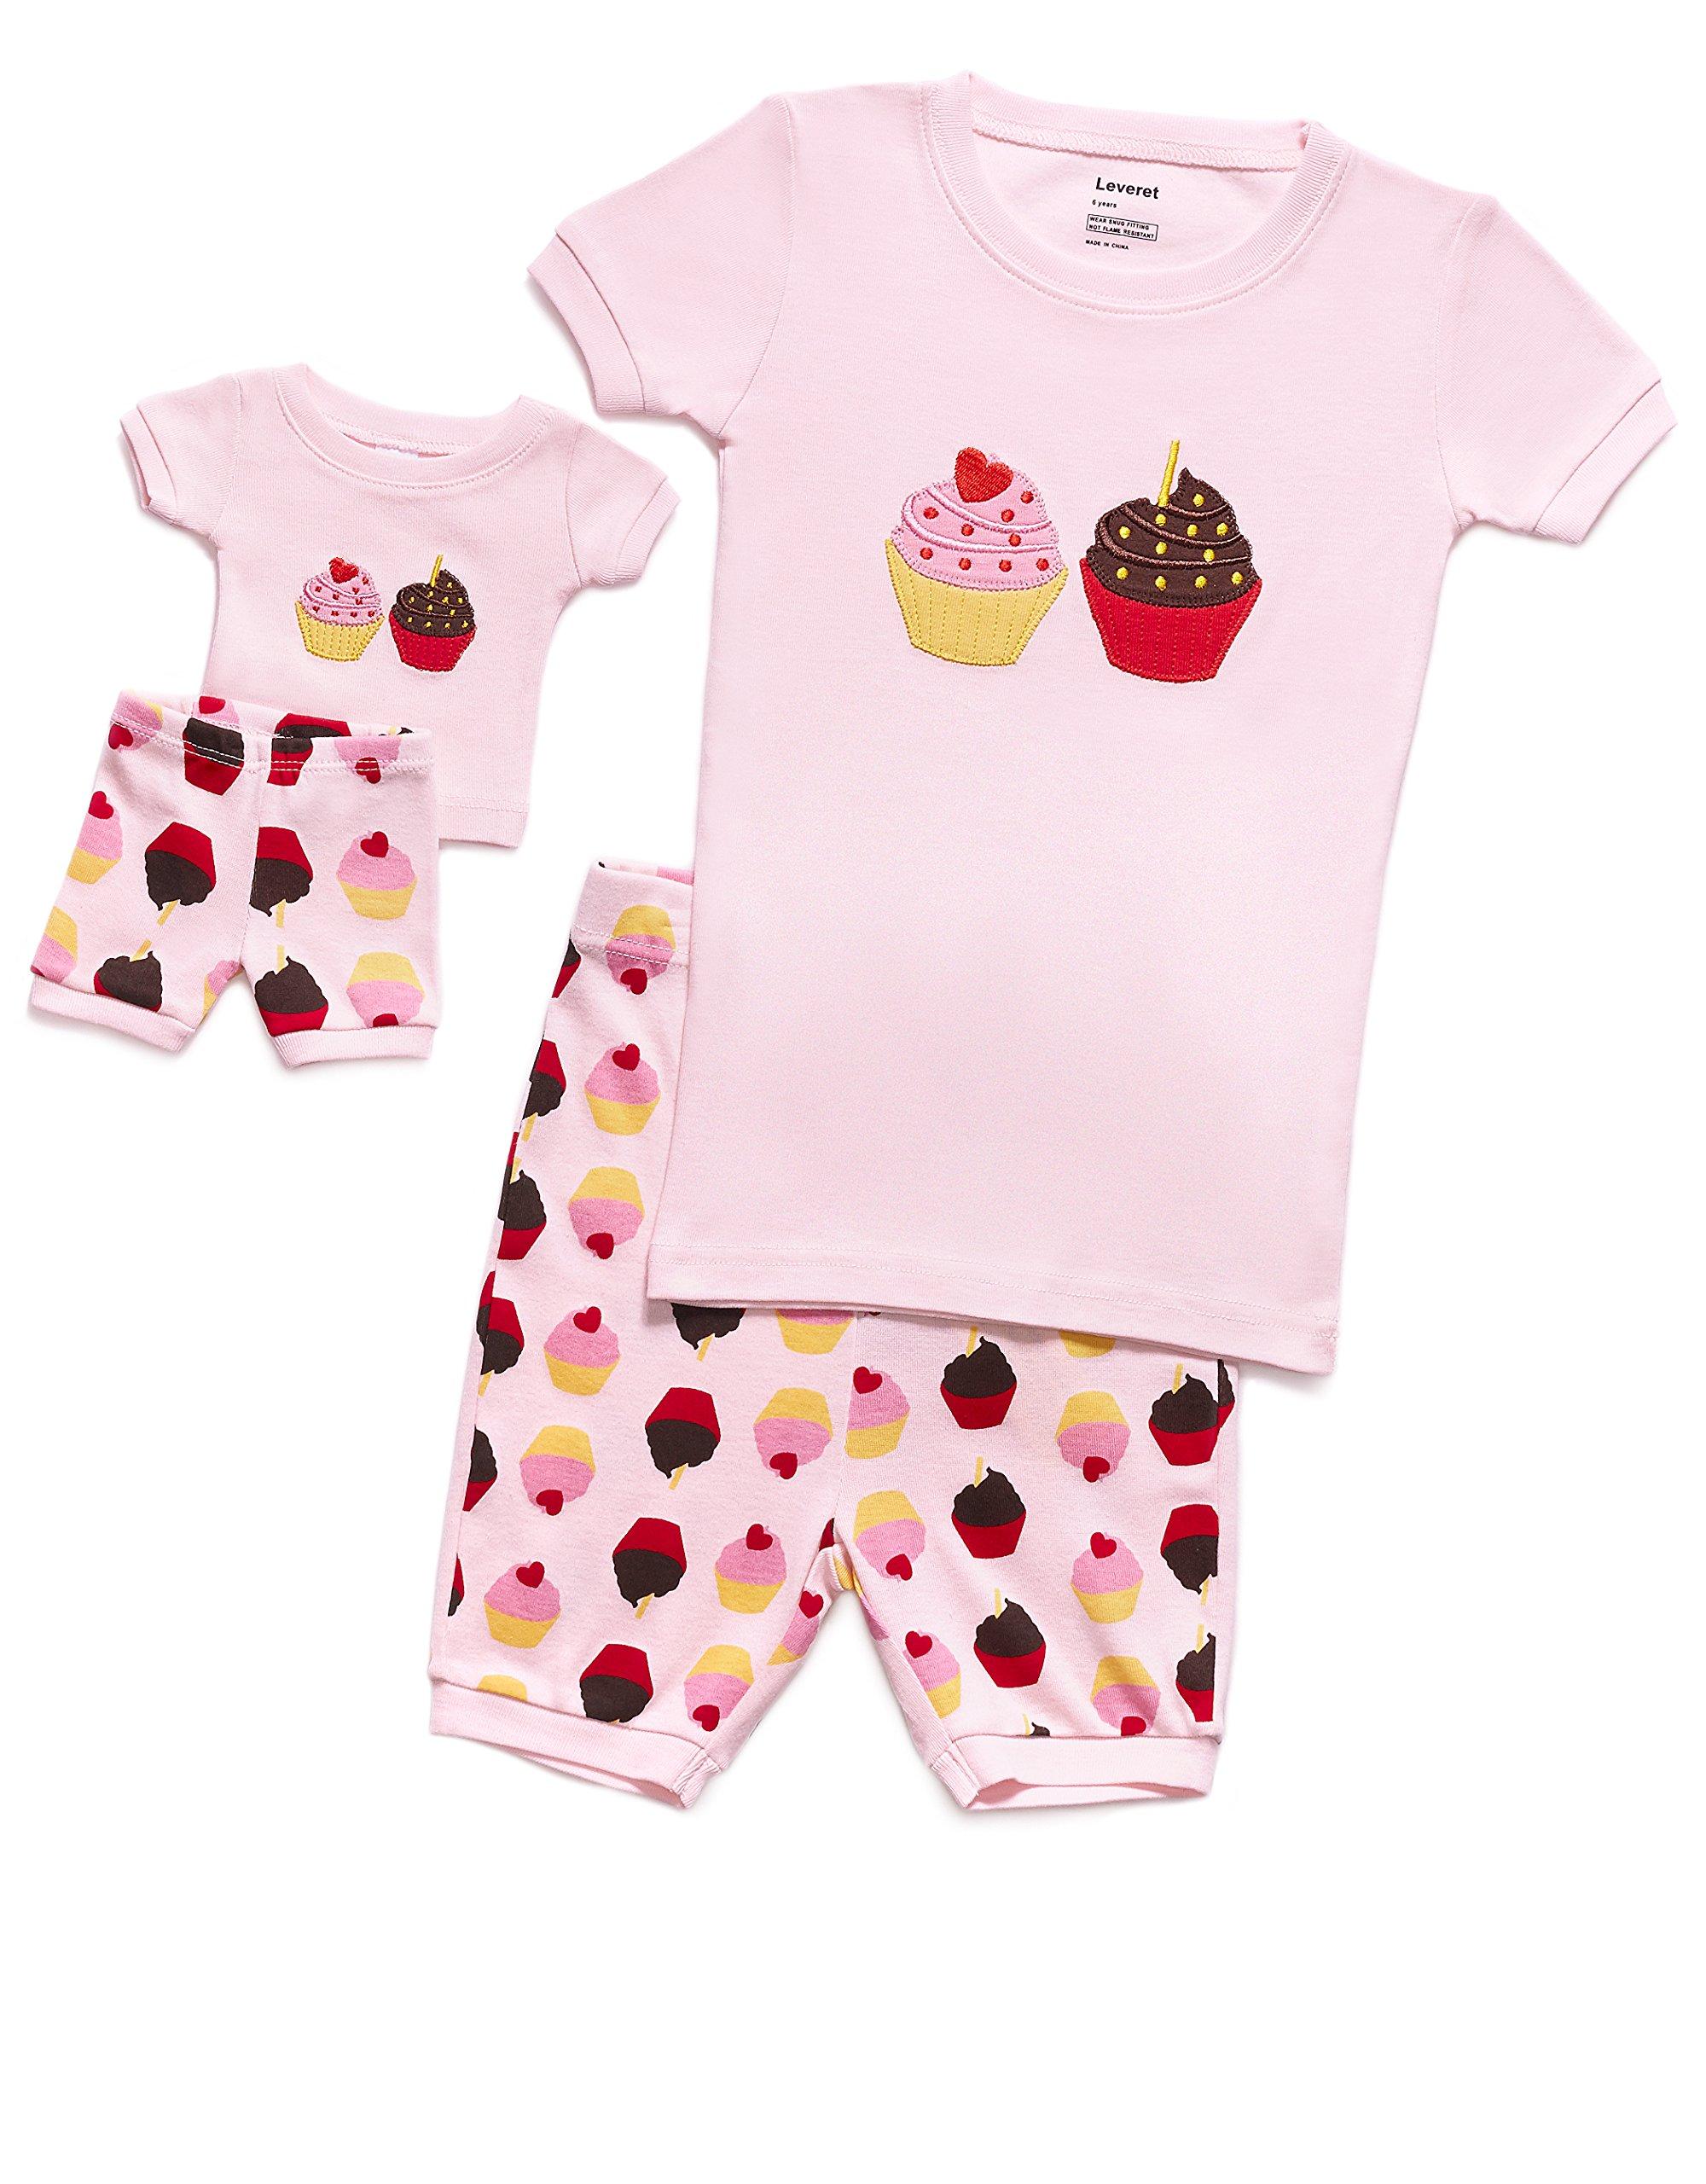 Leveret Shorts Cupcake Matching Doll & Girl 2 Piece Pajama Set 100% Cotton (8 Years)